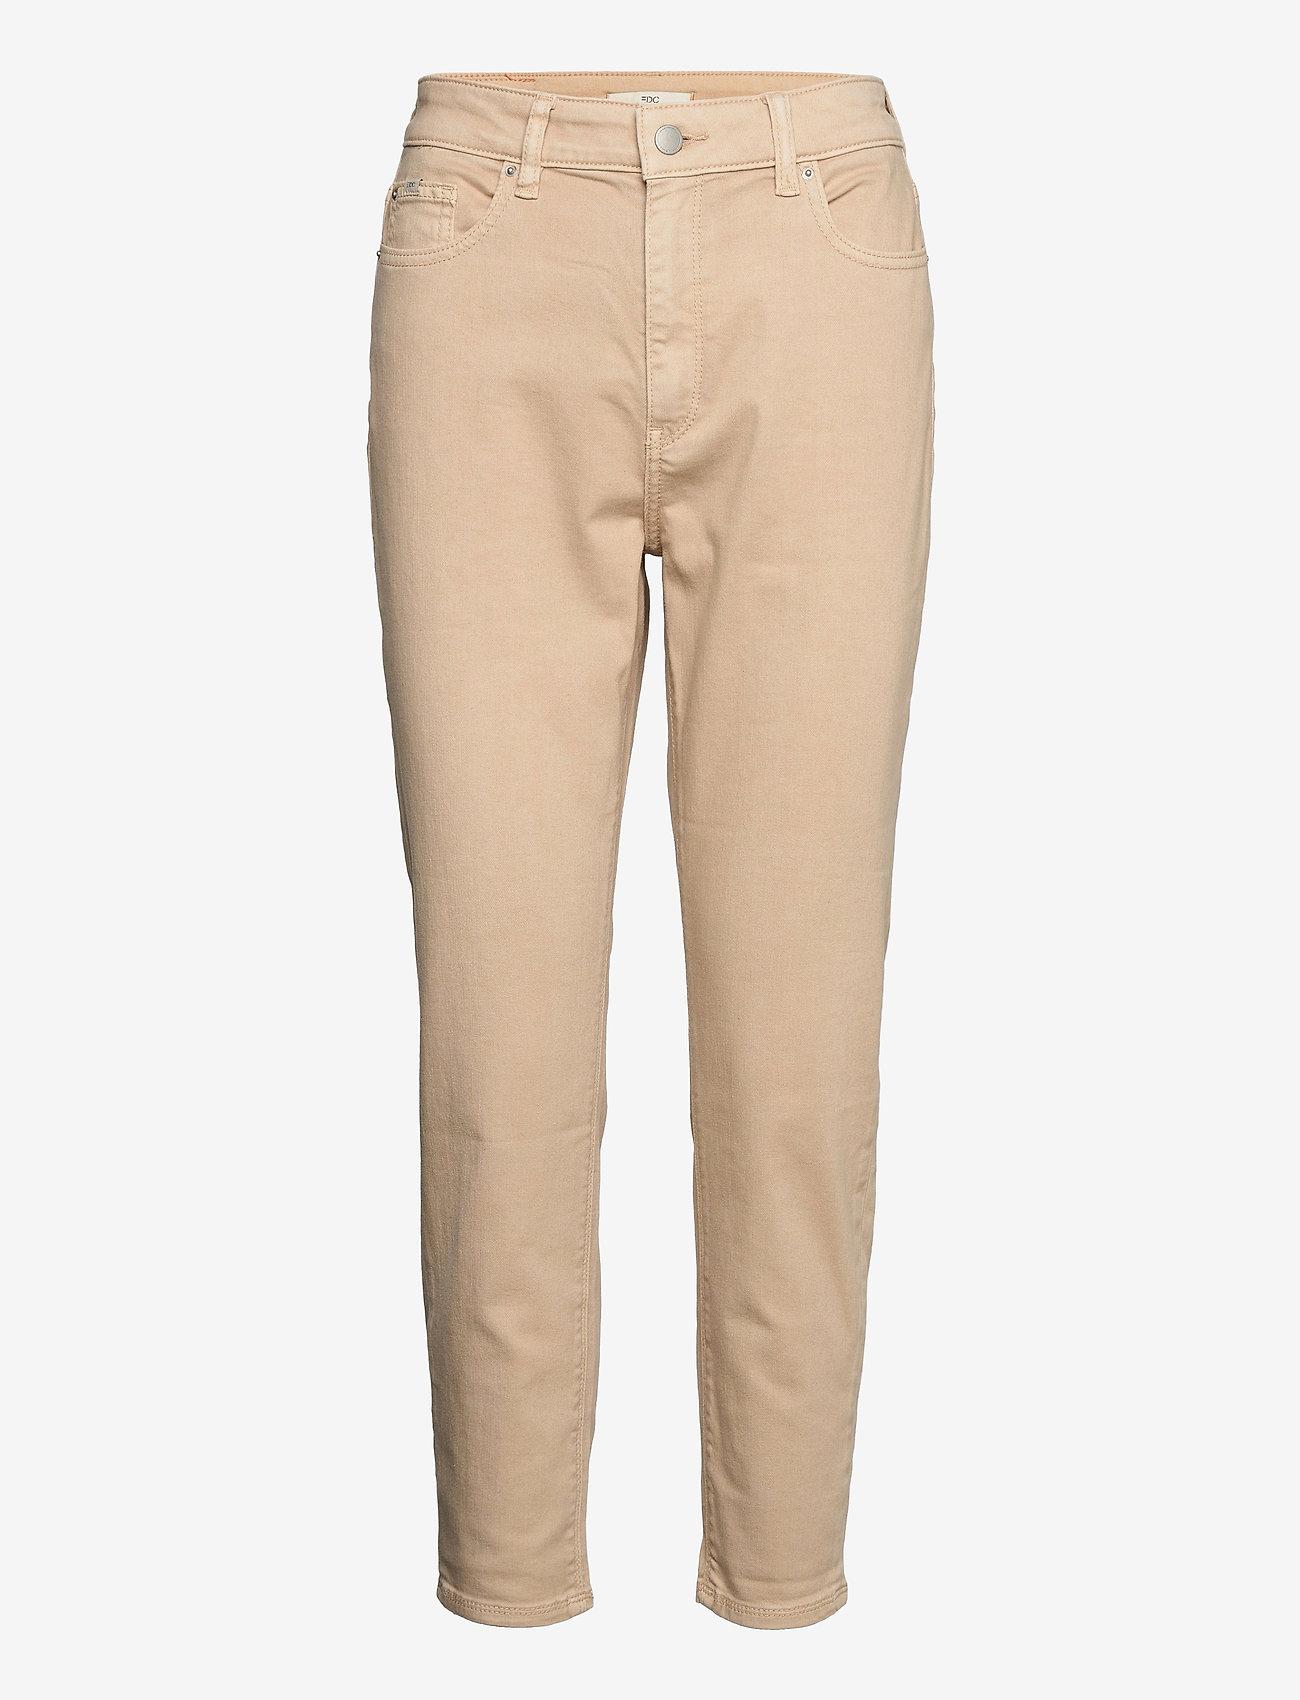 EDC by Esprit - Pants woven - straight regular - beige - 0